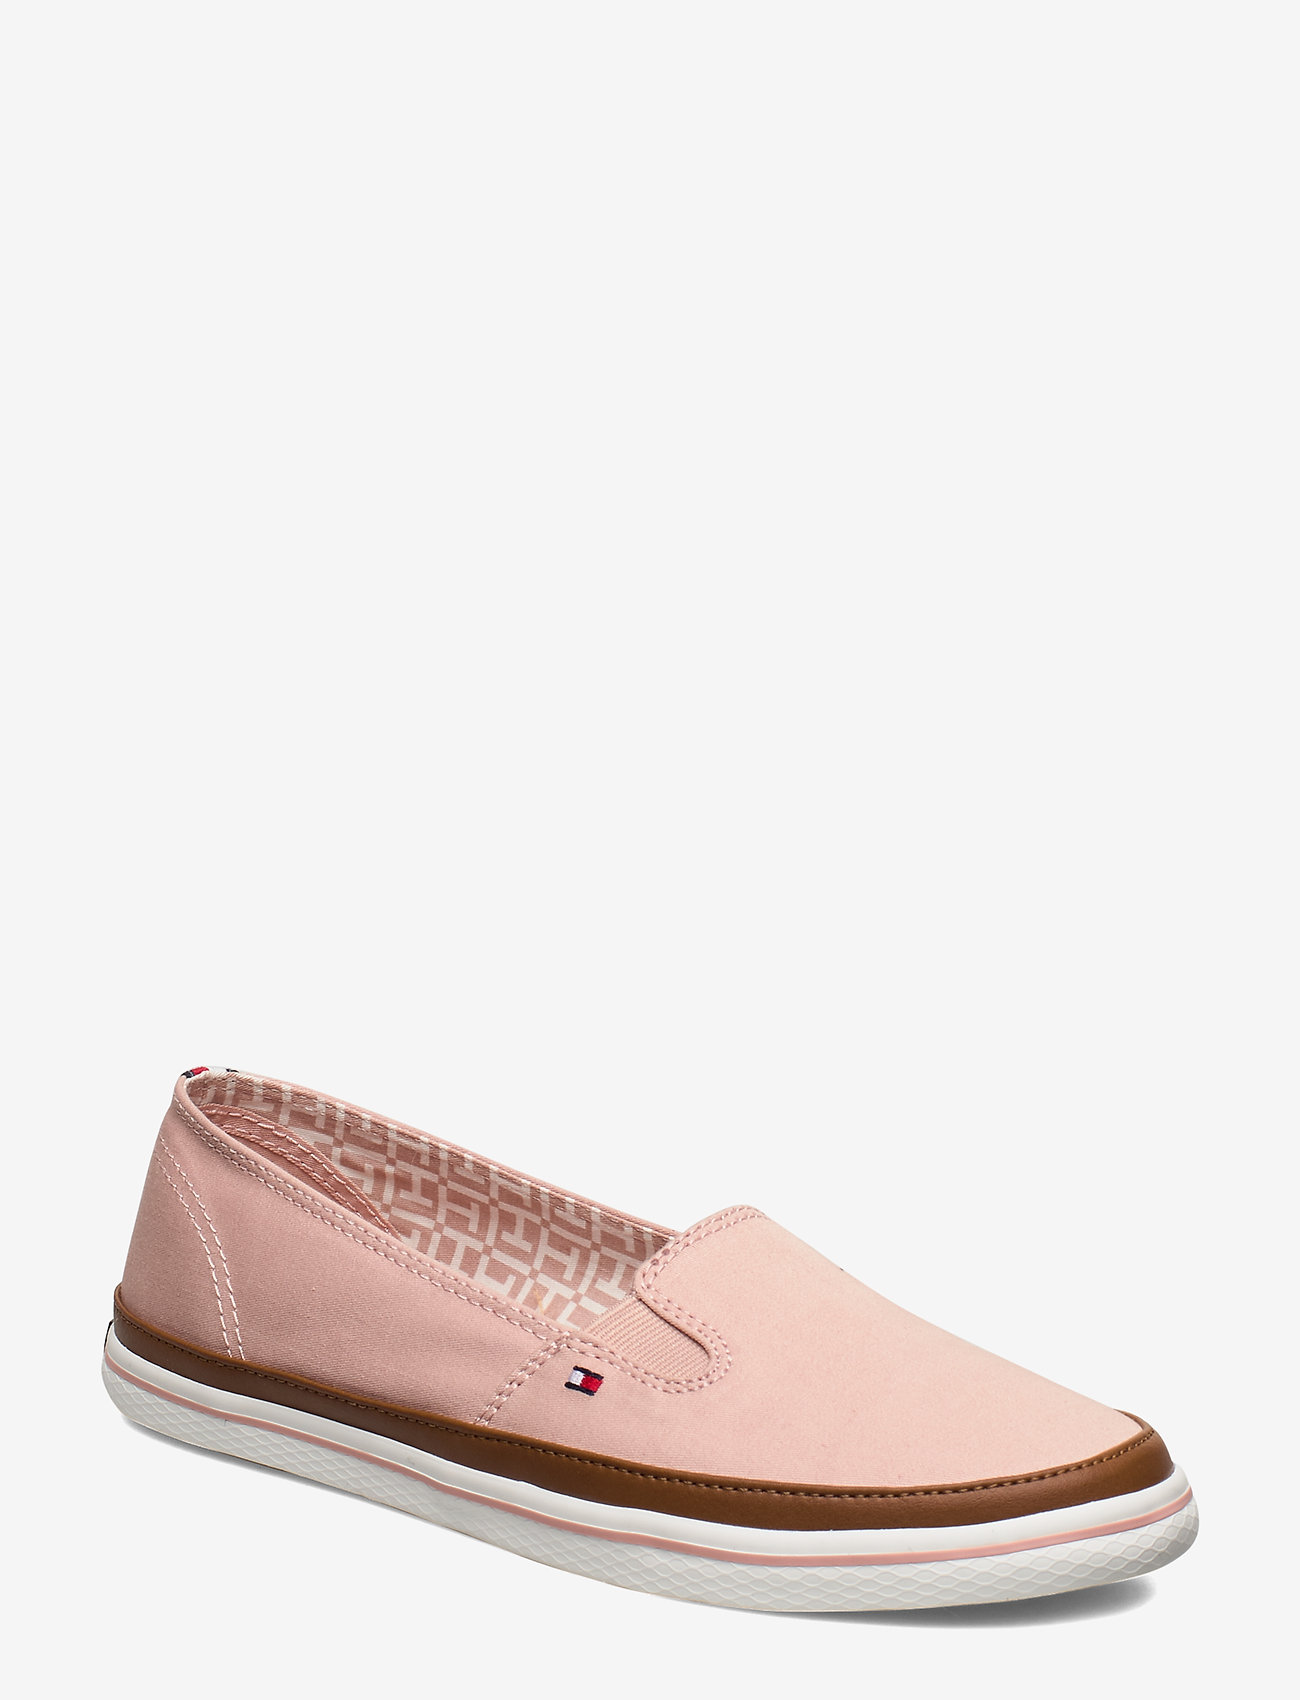 Tommy Hilfiger - ICONIC KESHA SLIP ON - slip-on sneakers - dusty rose - 0